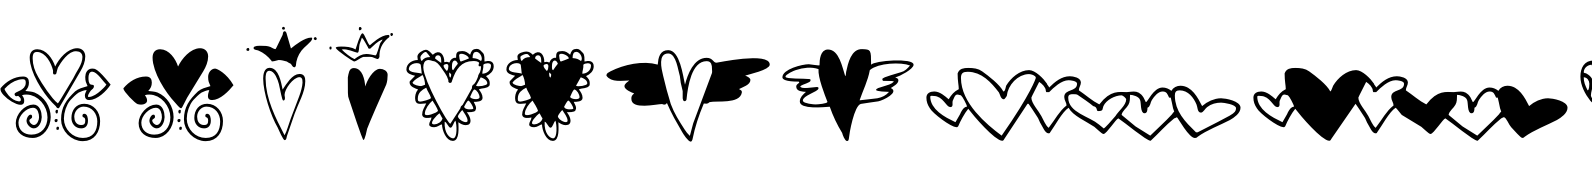 Hearts & Swirls Too